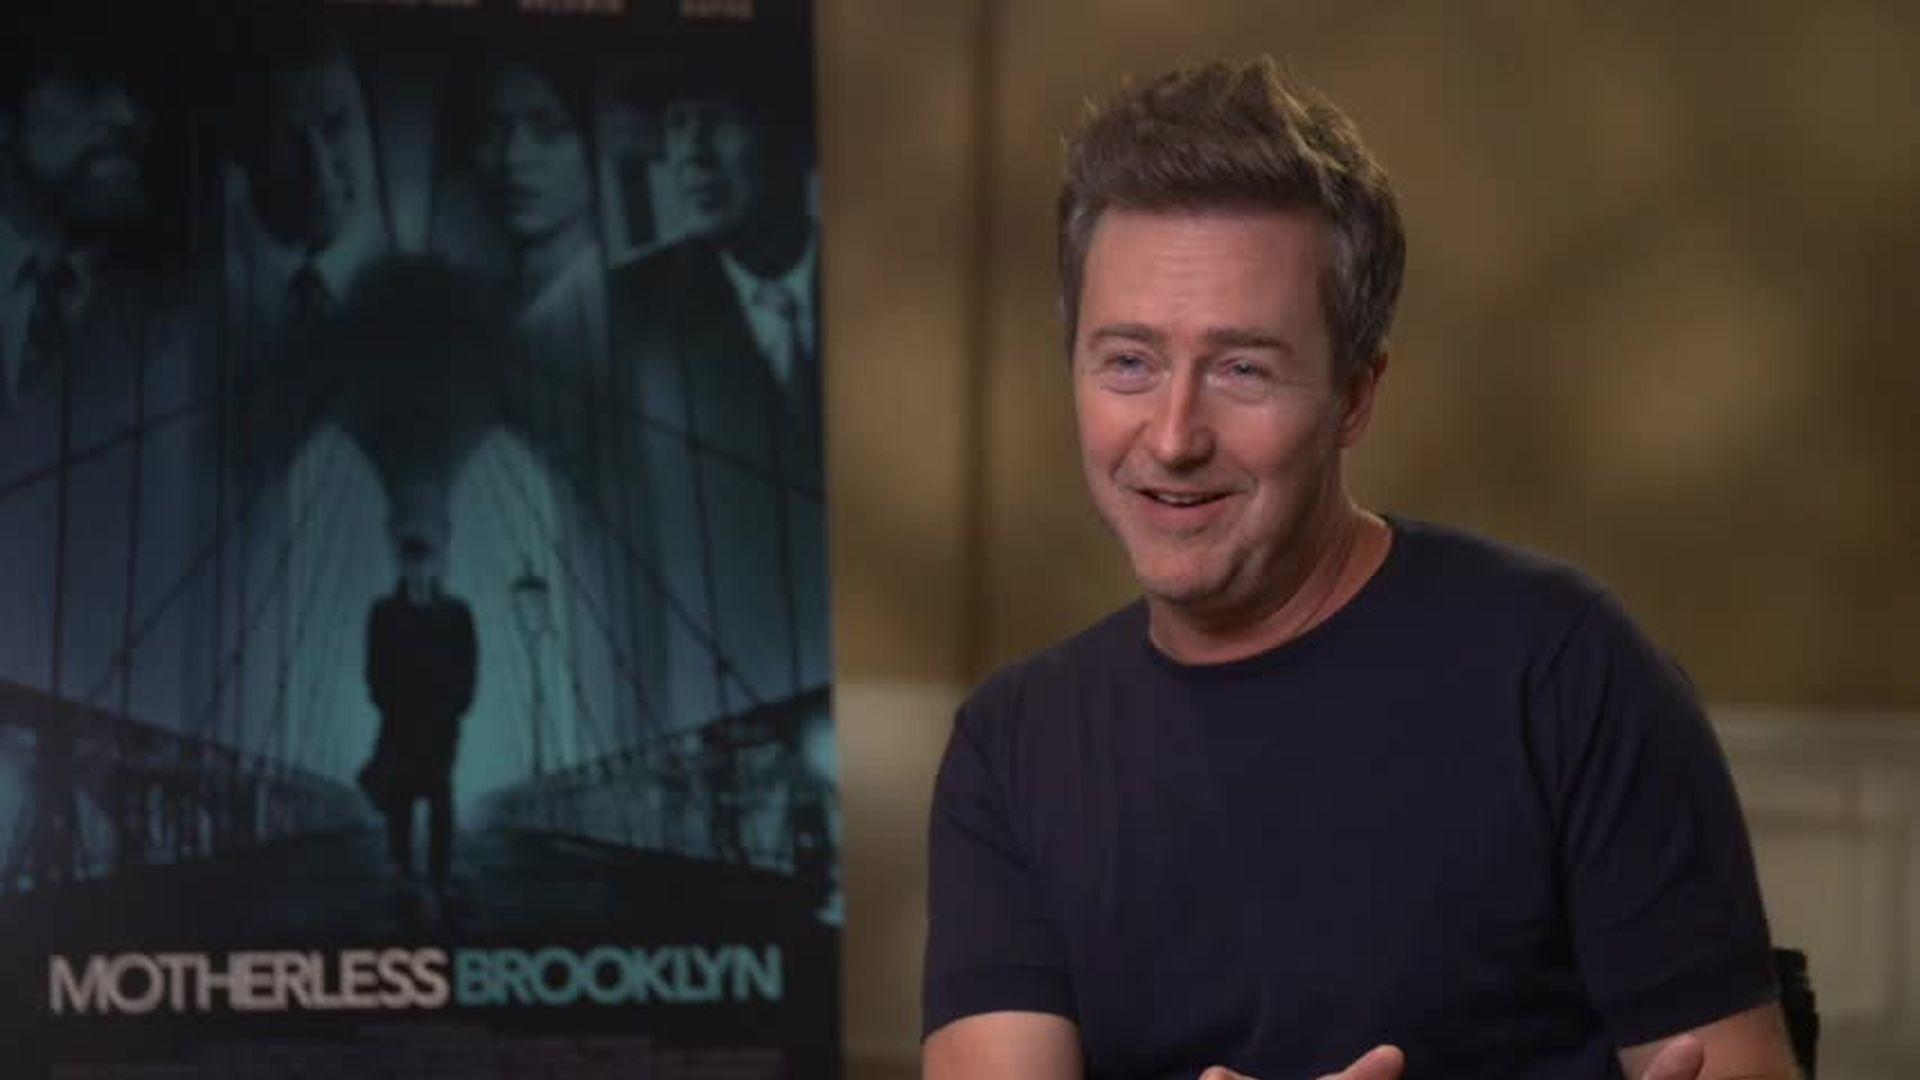 Edward Norton Talks Writing, Directing, and Starring in 'Motherless Brooklyn'